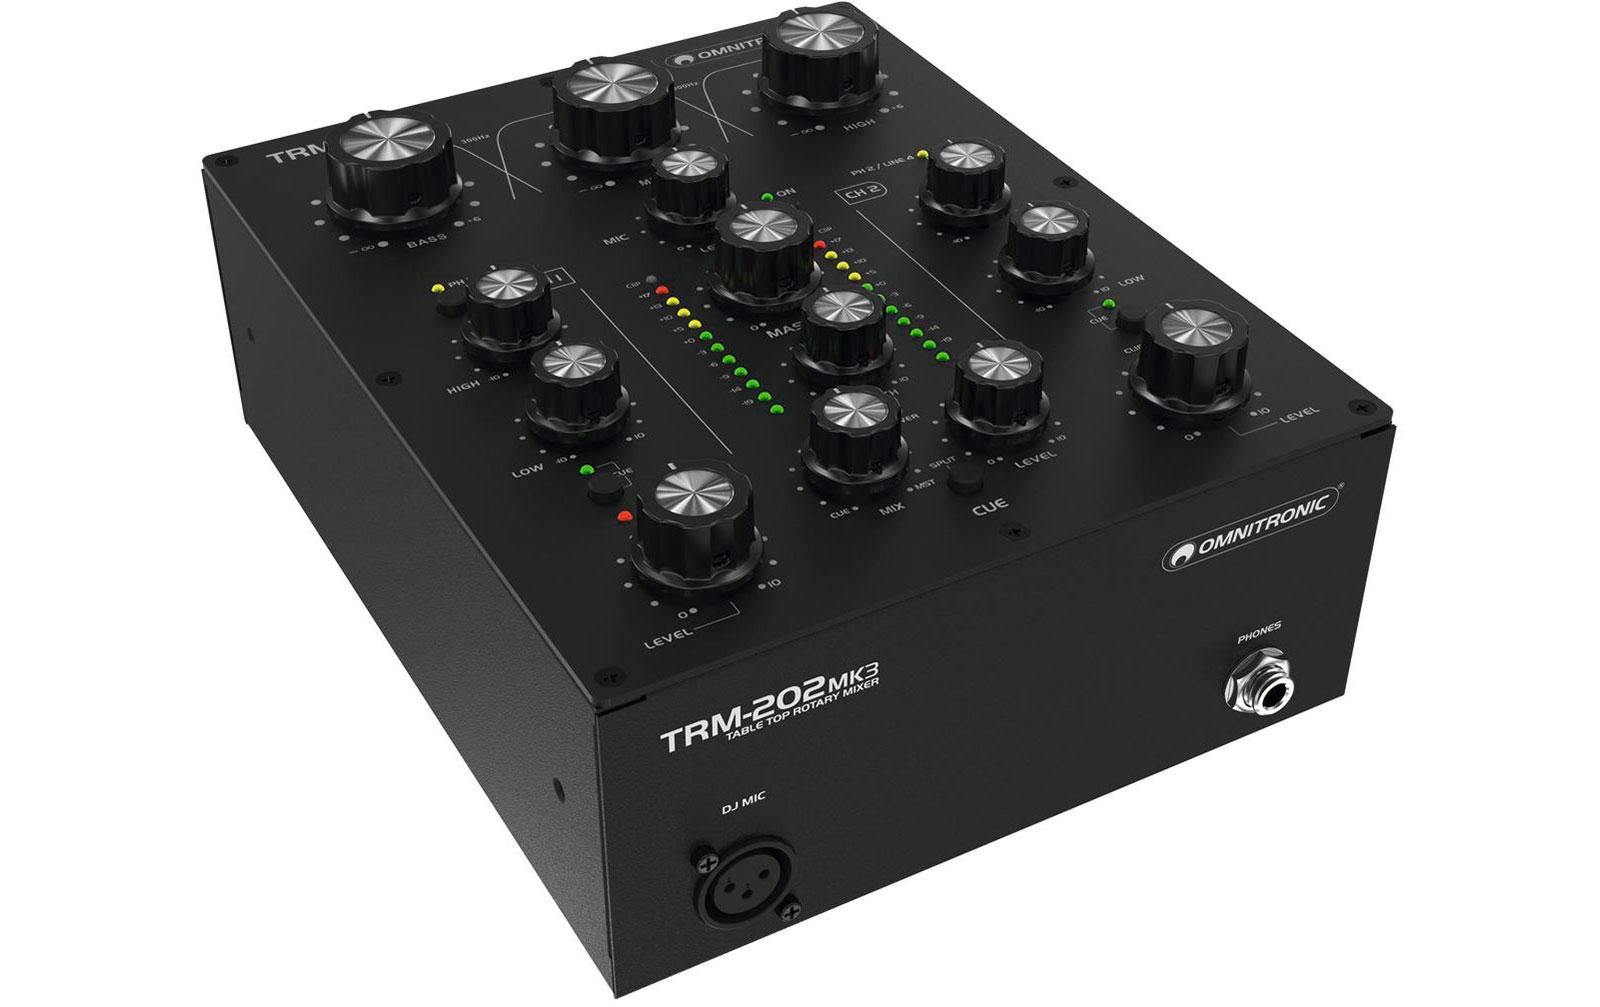 omnitronic-trm-202-mk3-2-kanal-rotary-mixer